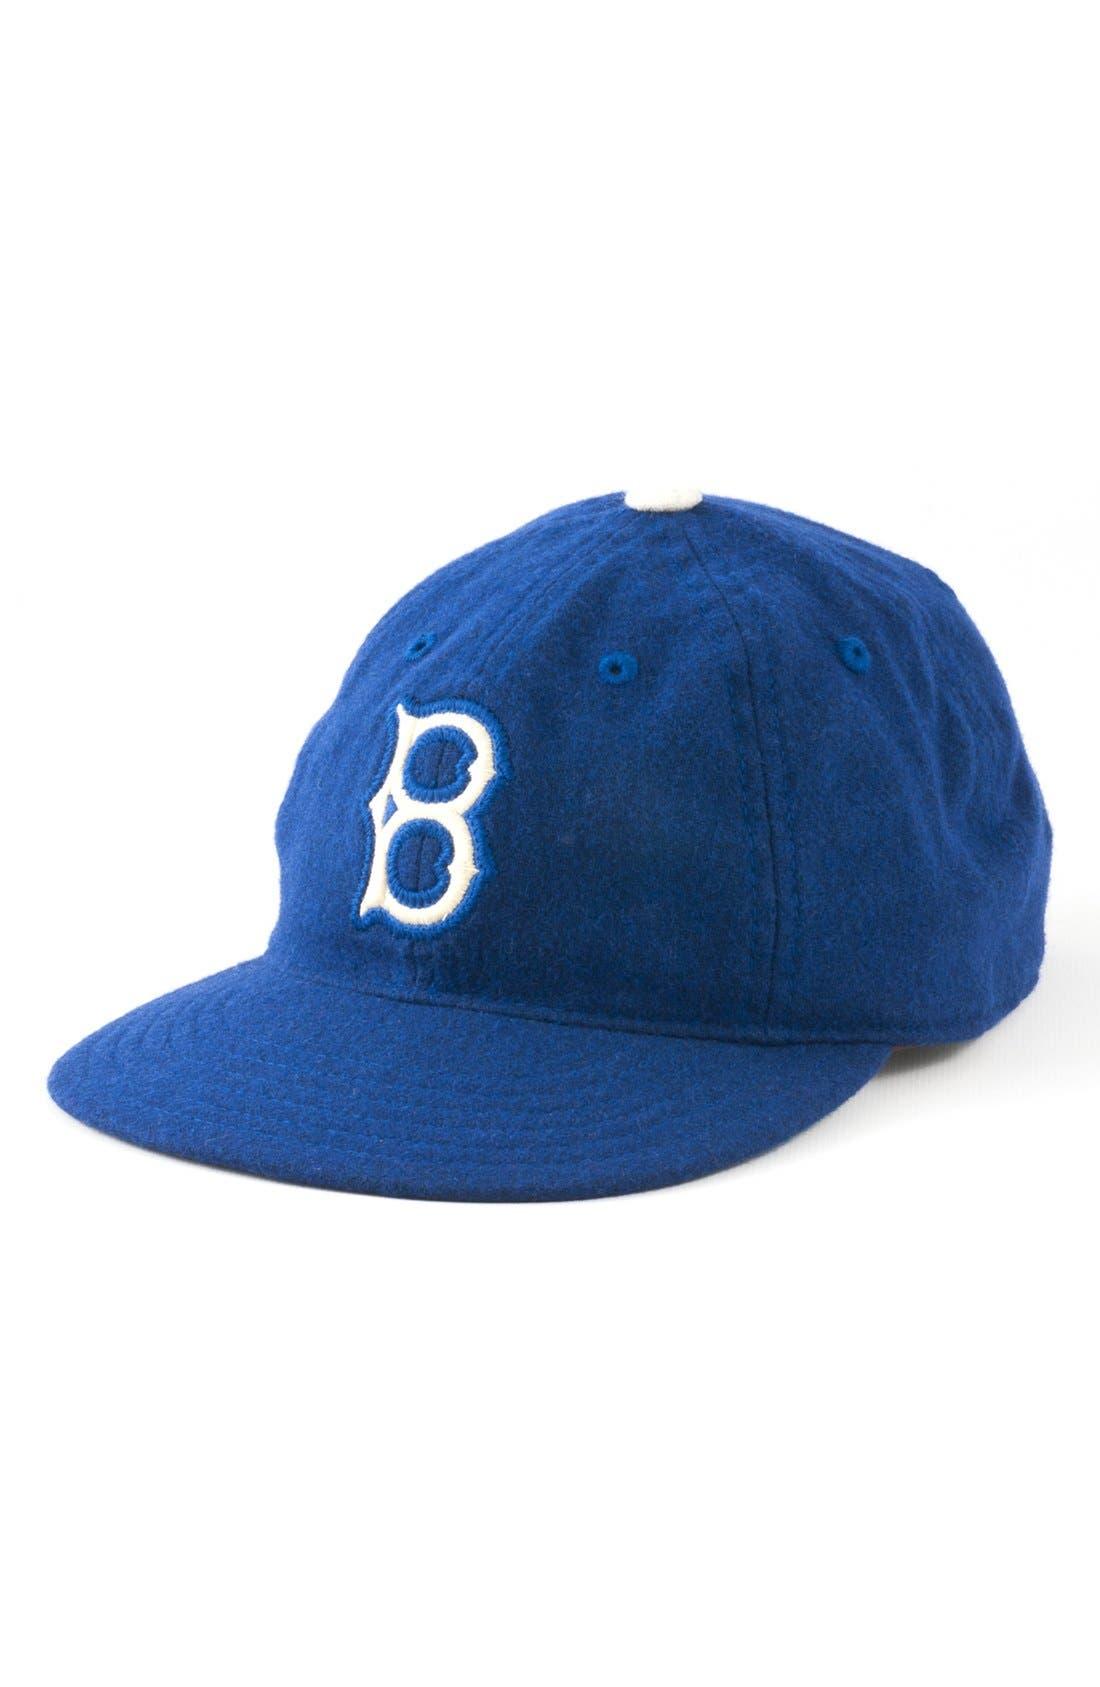 Alternate Image 1 Selected - American Needle 'Brooklyn Dodgers - Statesman' Baseball Cap